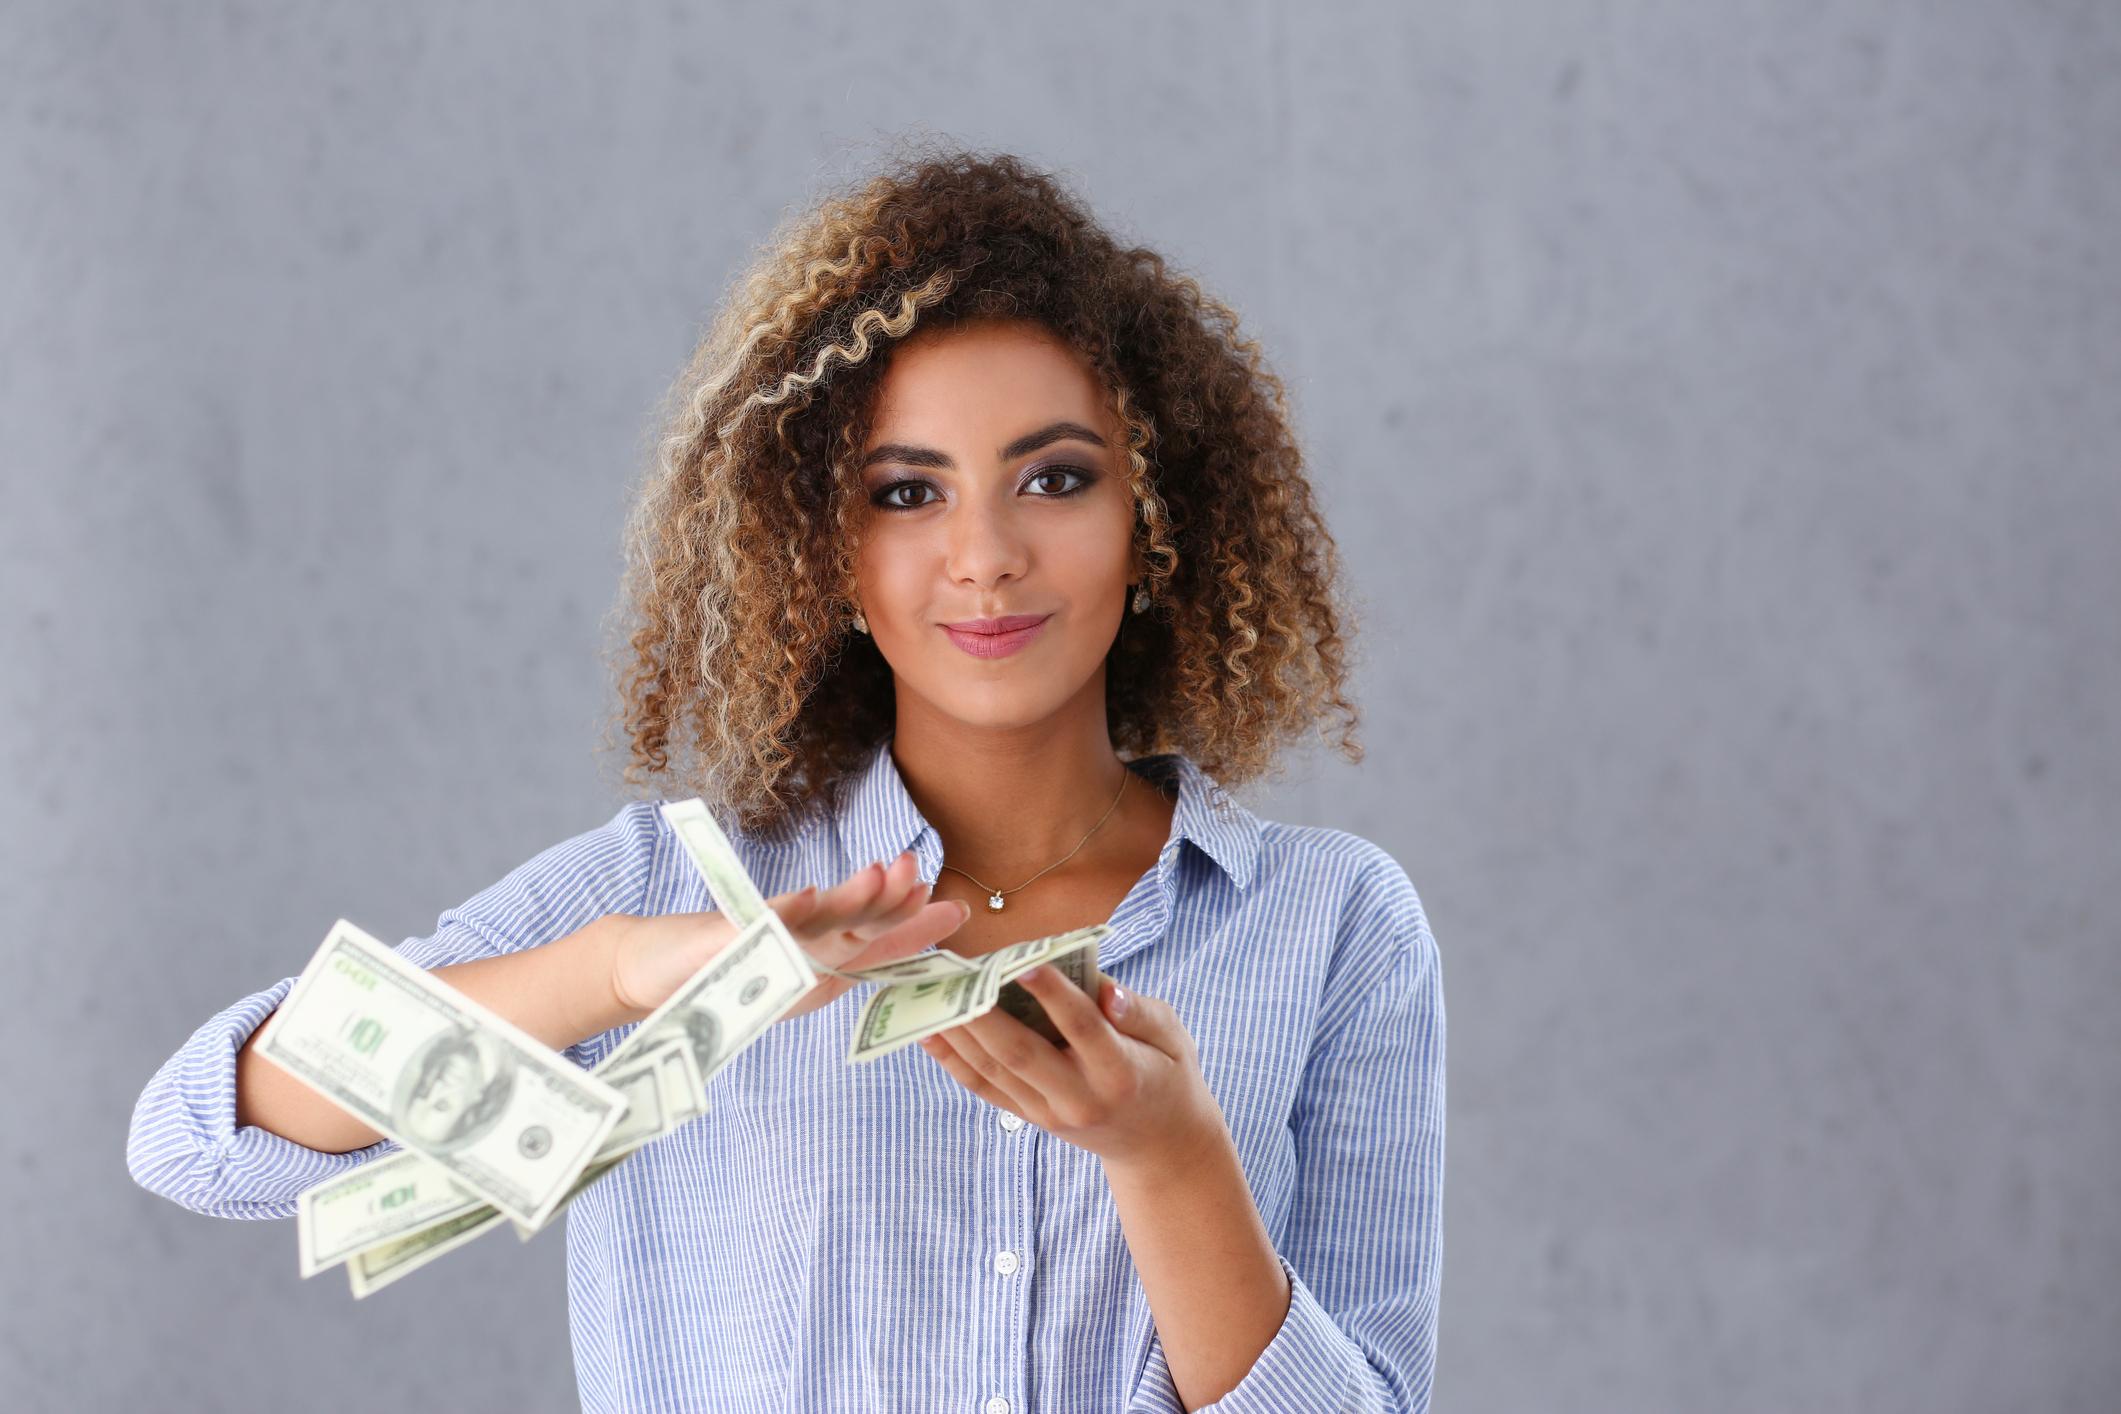 young woman making it rain 100-dollar bills